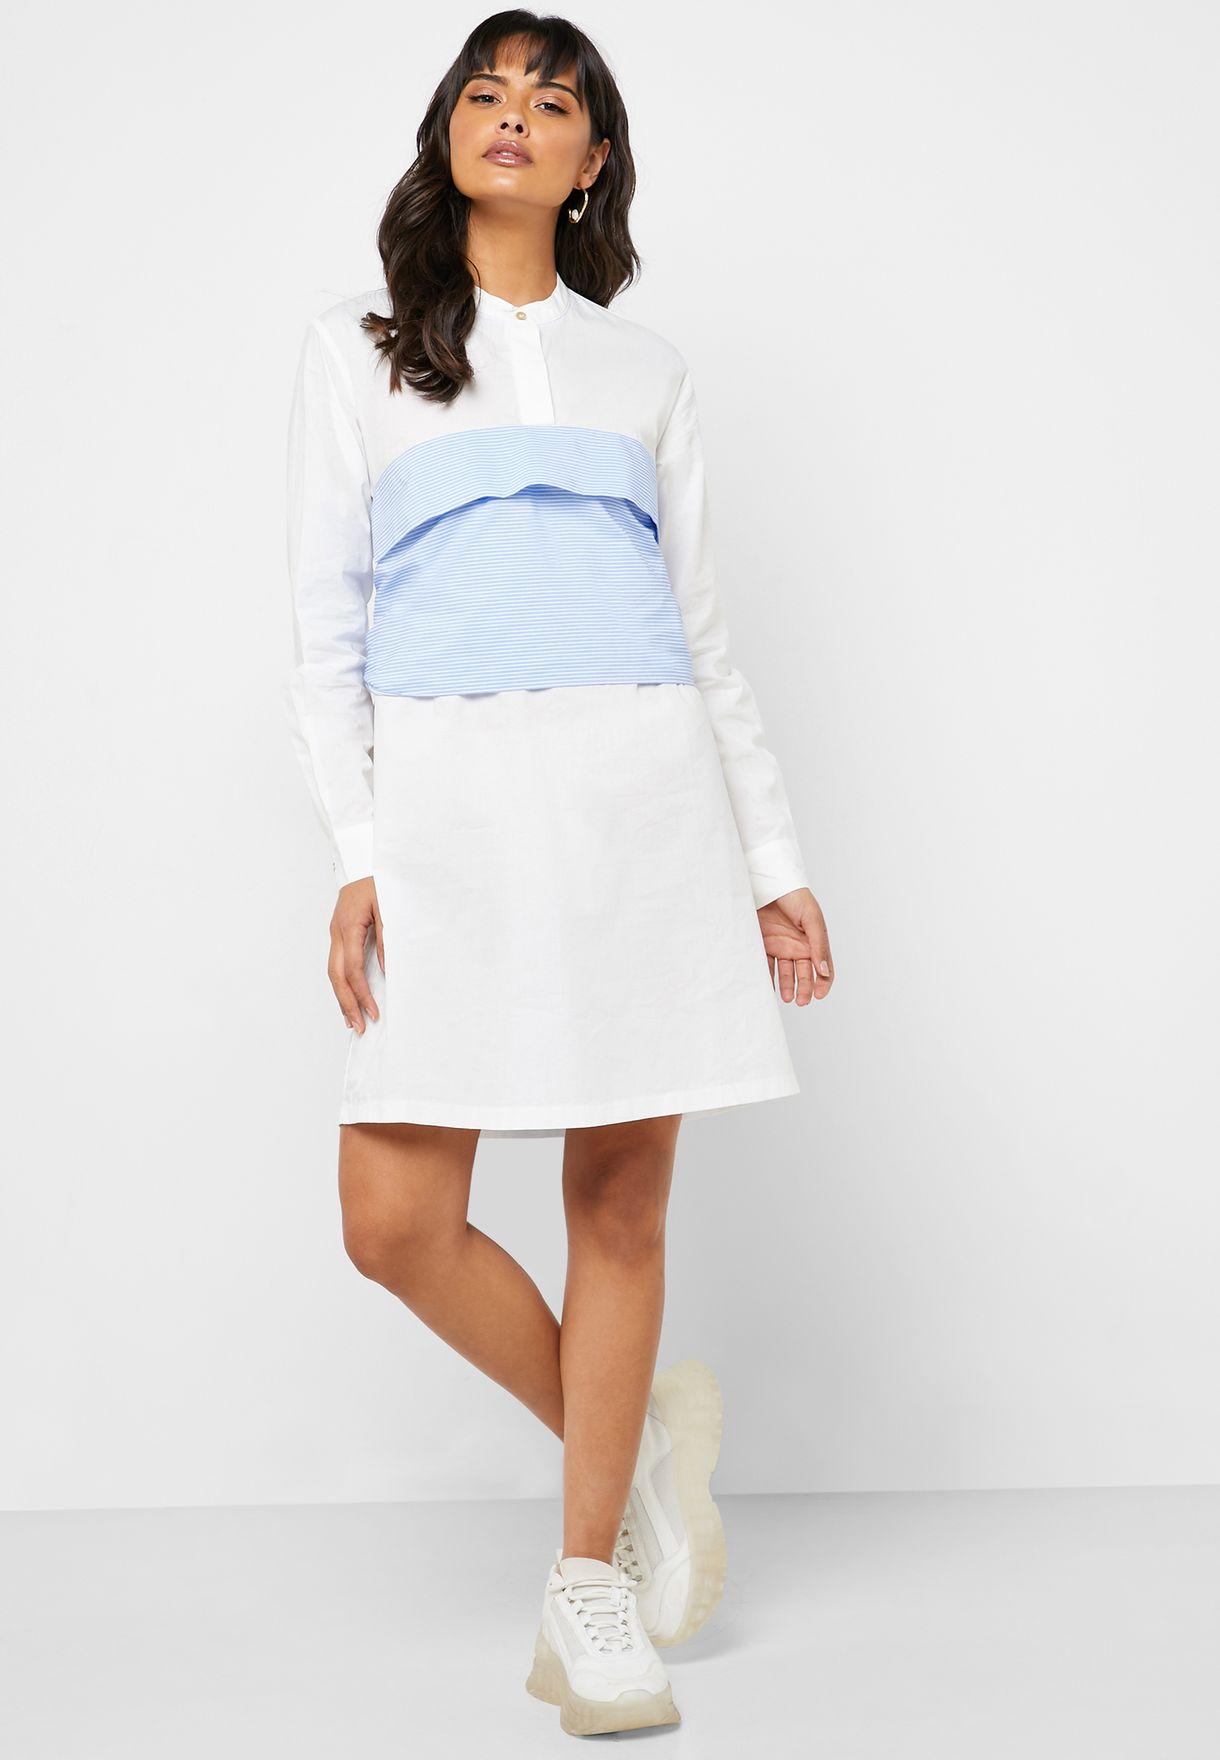 Iconic Colorblock Dress - Fashion